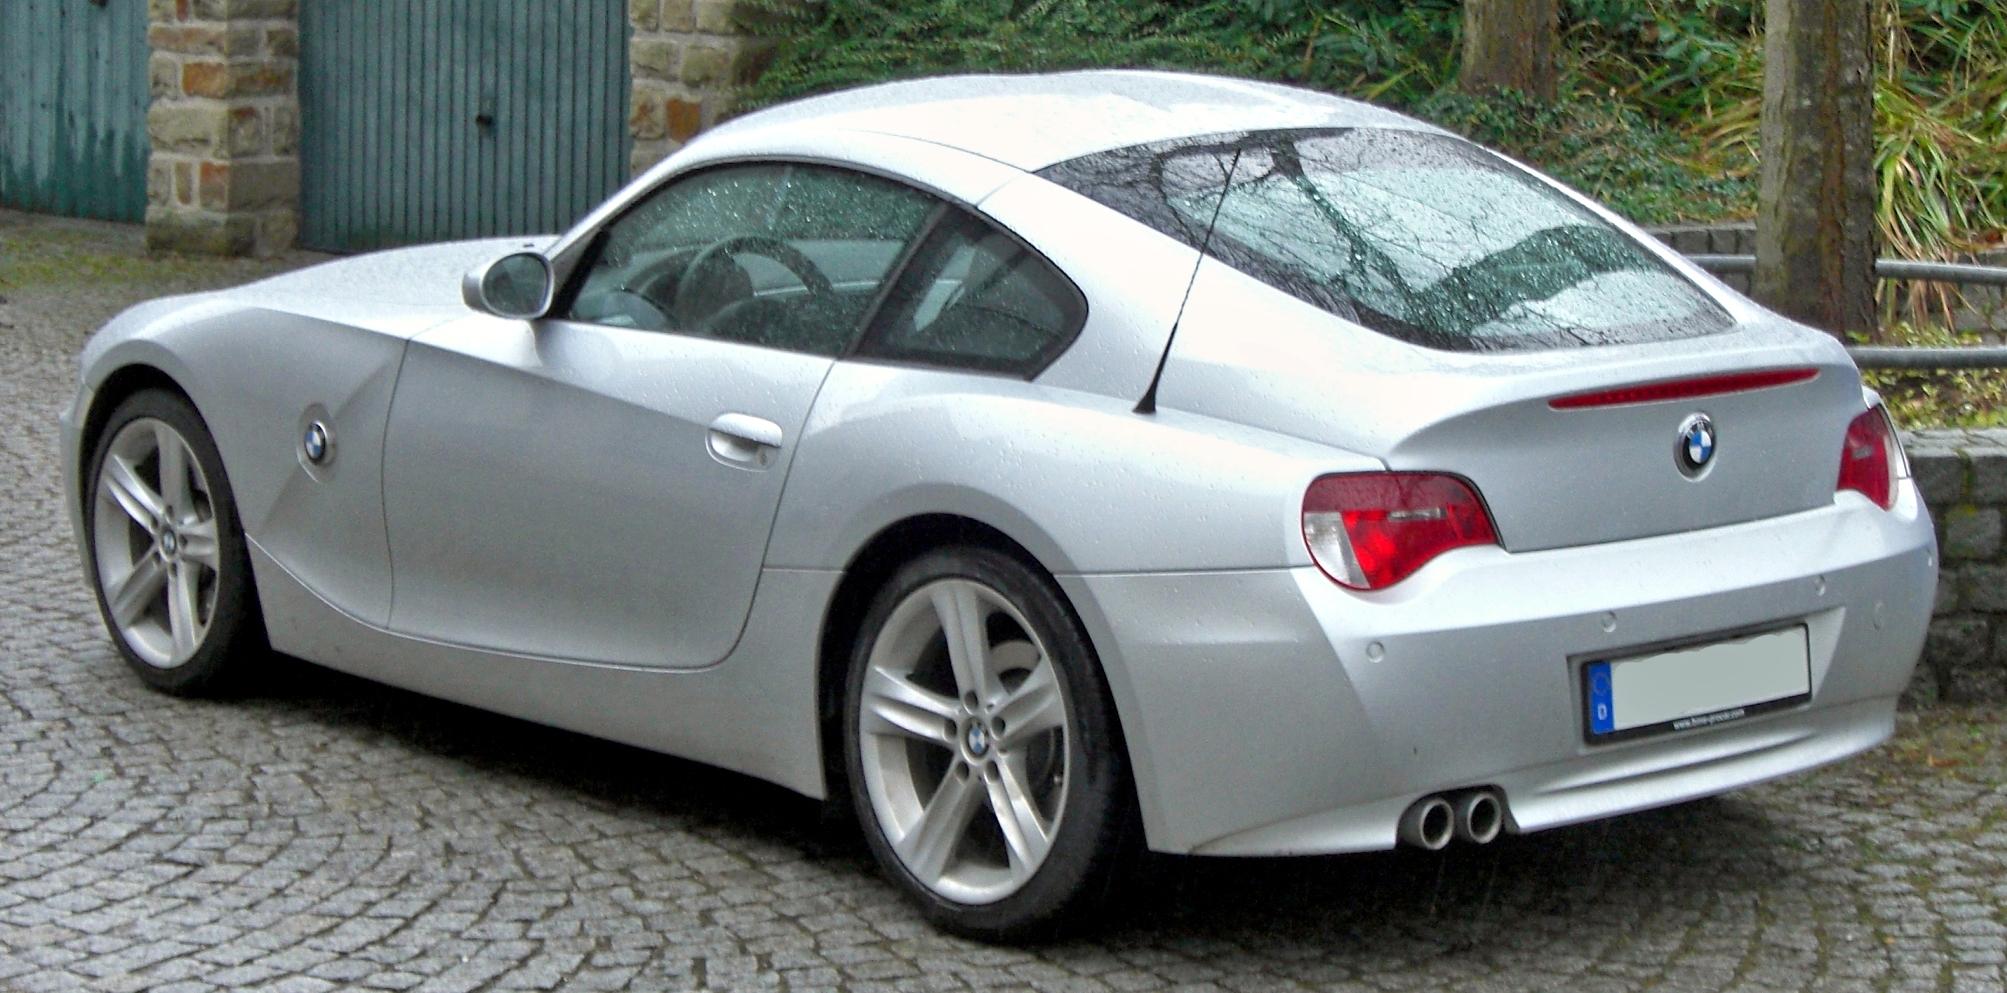 Vwvortex Com The Modern Car Door Handle